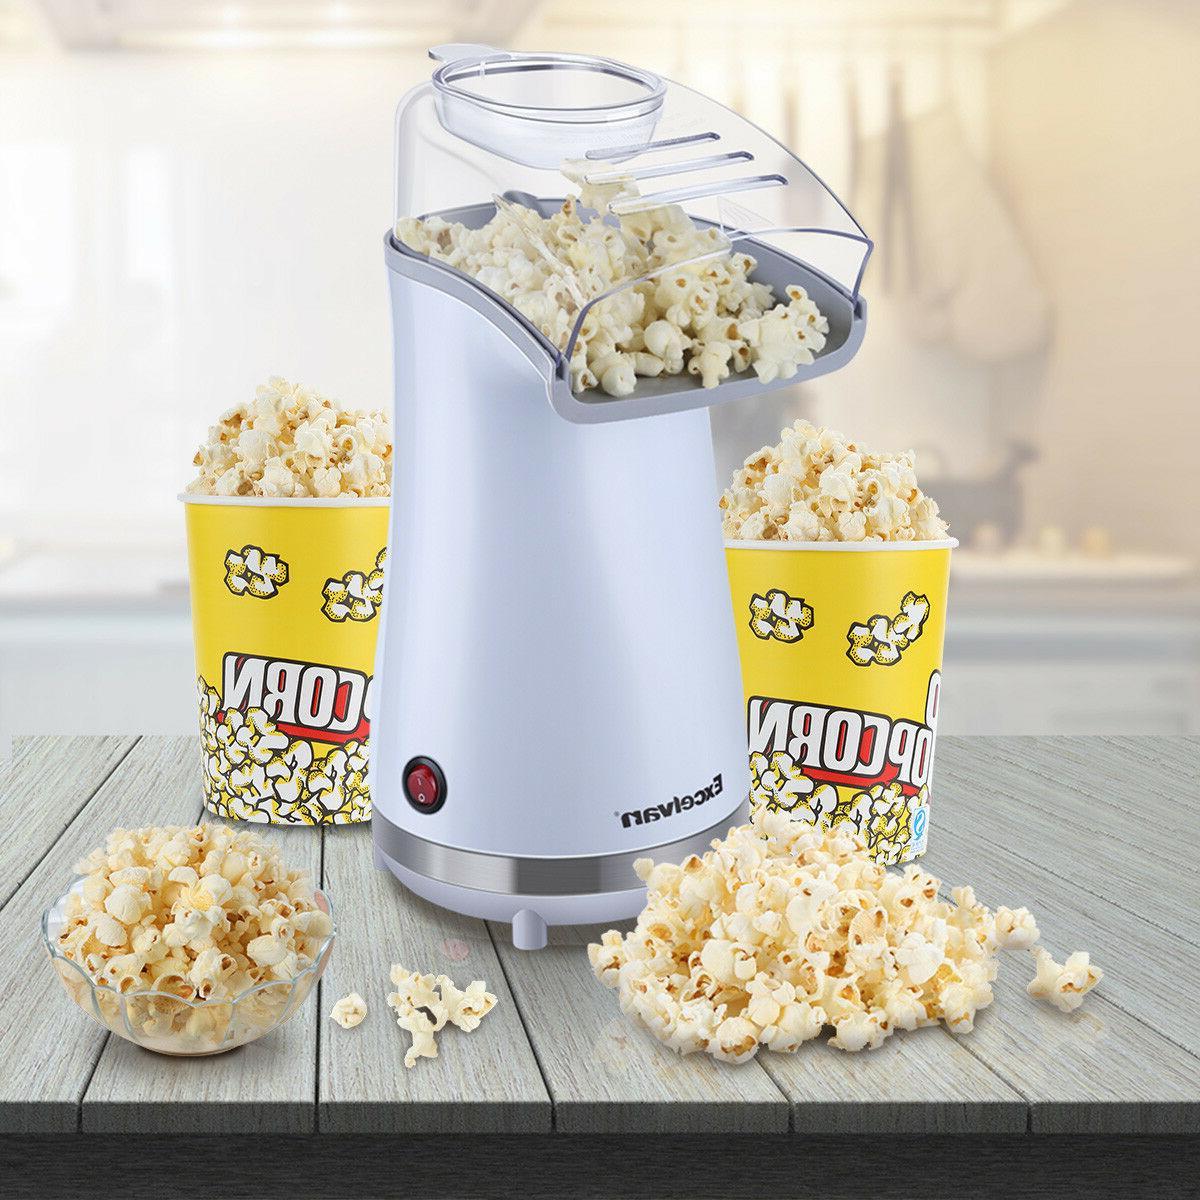 16 Cups Popcorn Popcorn Maker Makes w/ Snack